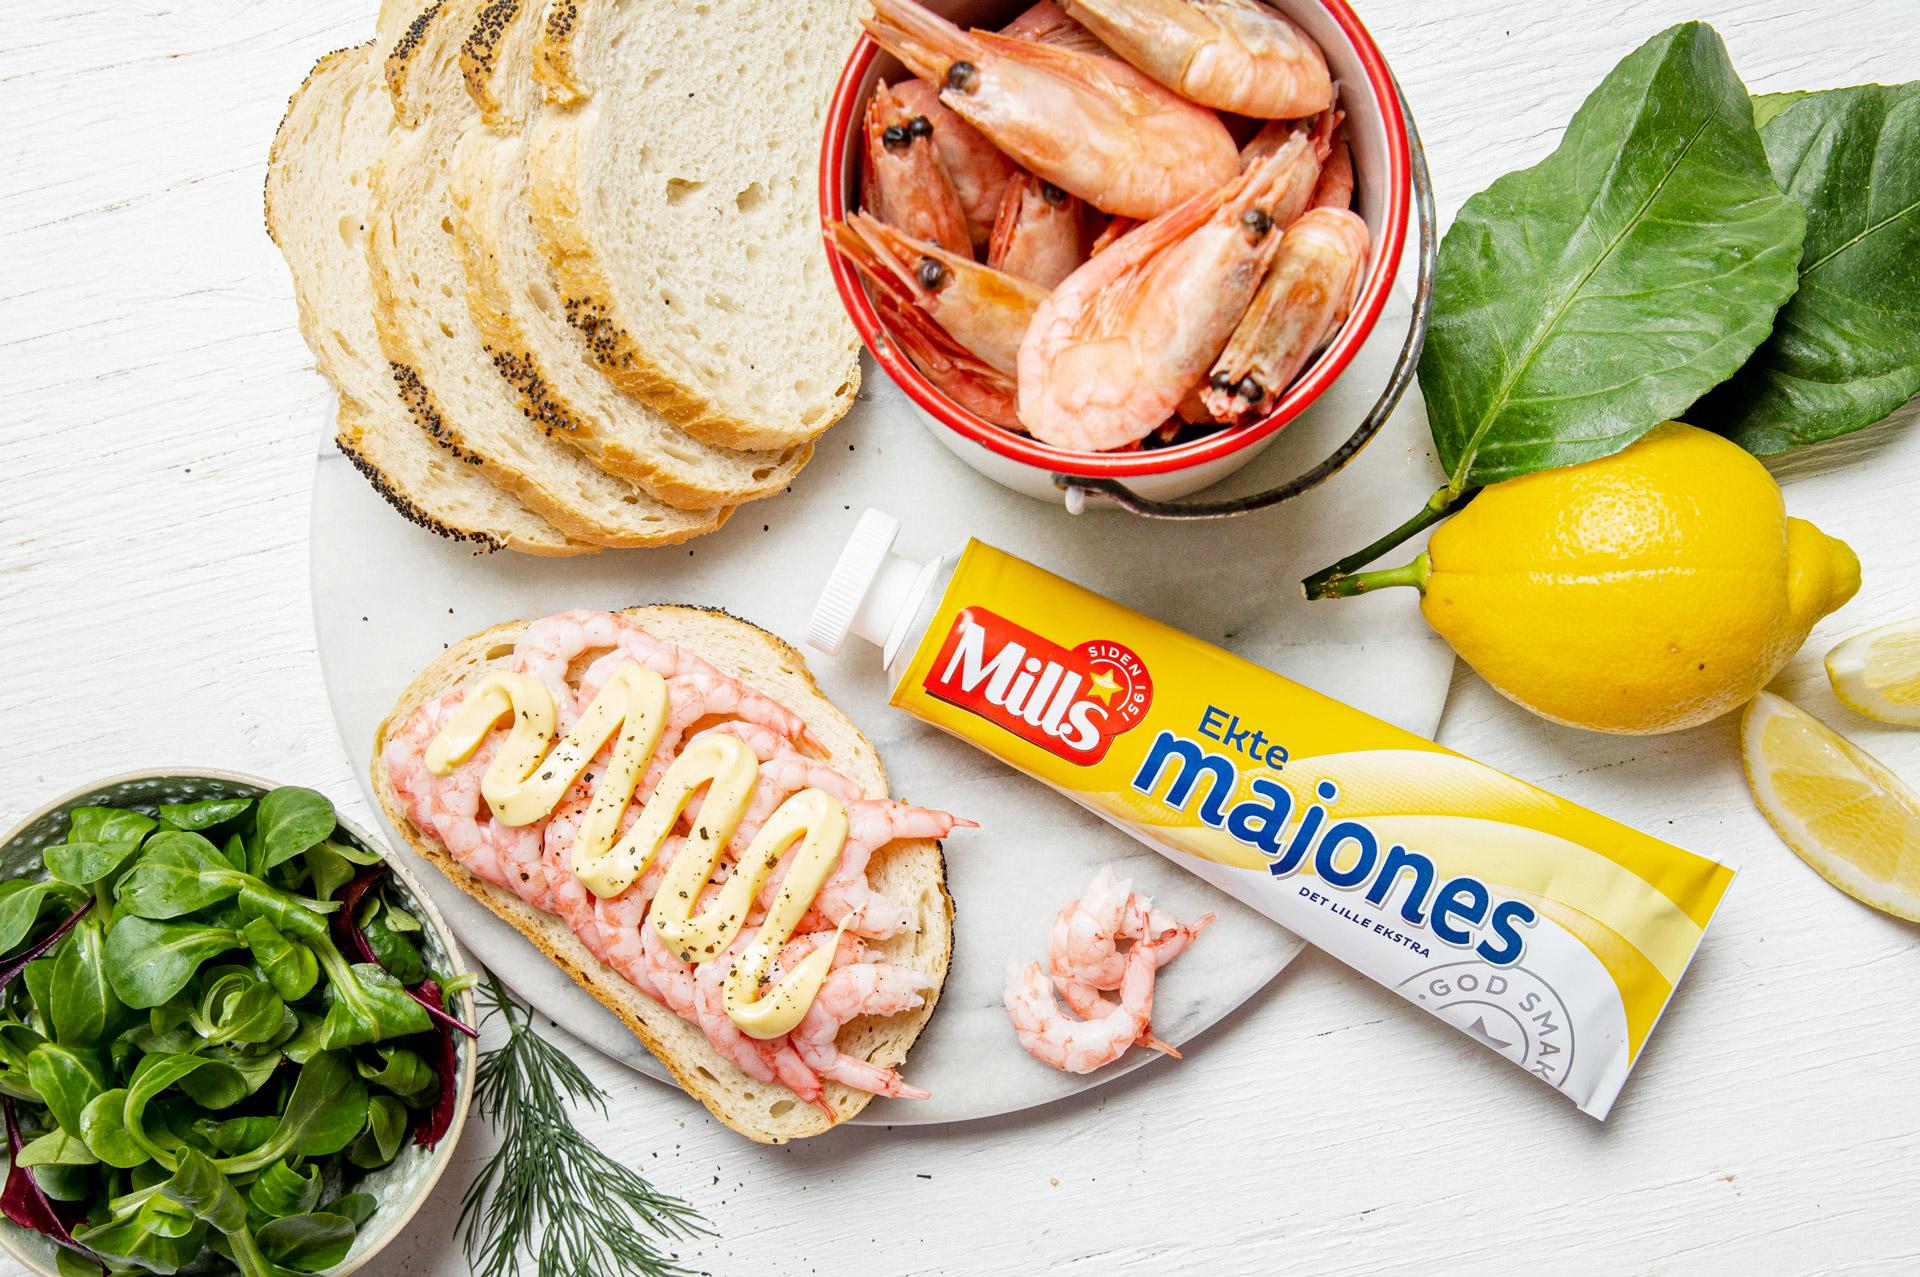 Mills mayonnaise